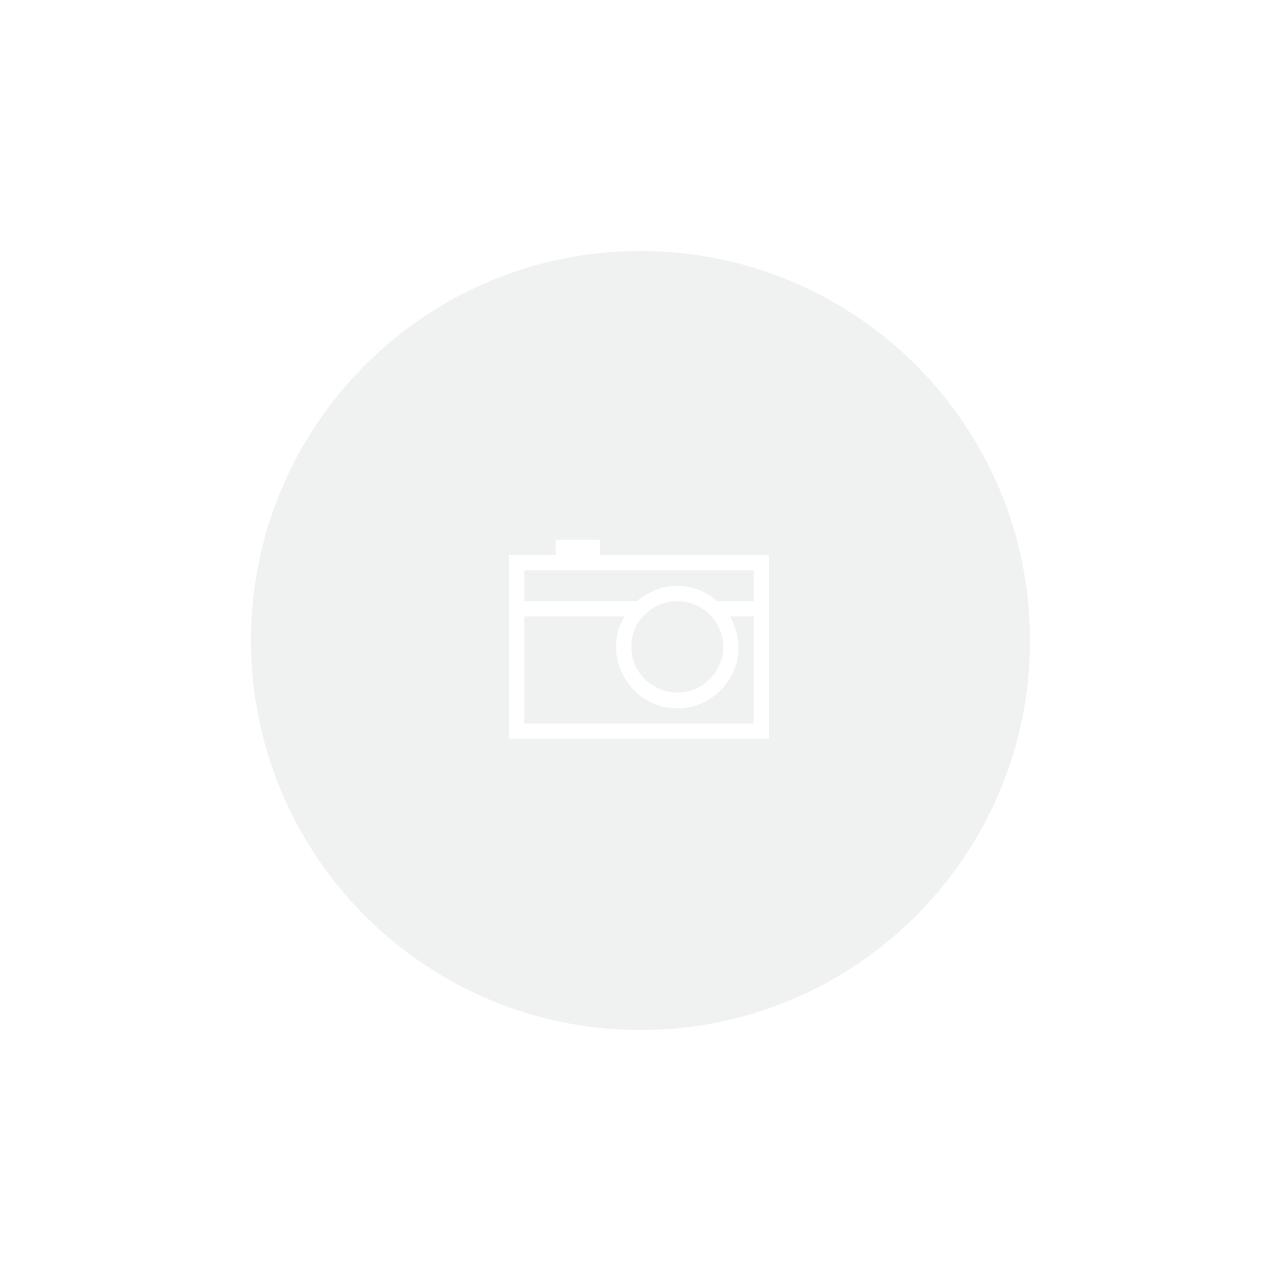 Papel Artesanal Indiano - Ref. 102